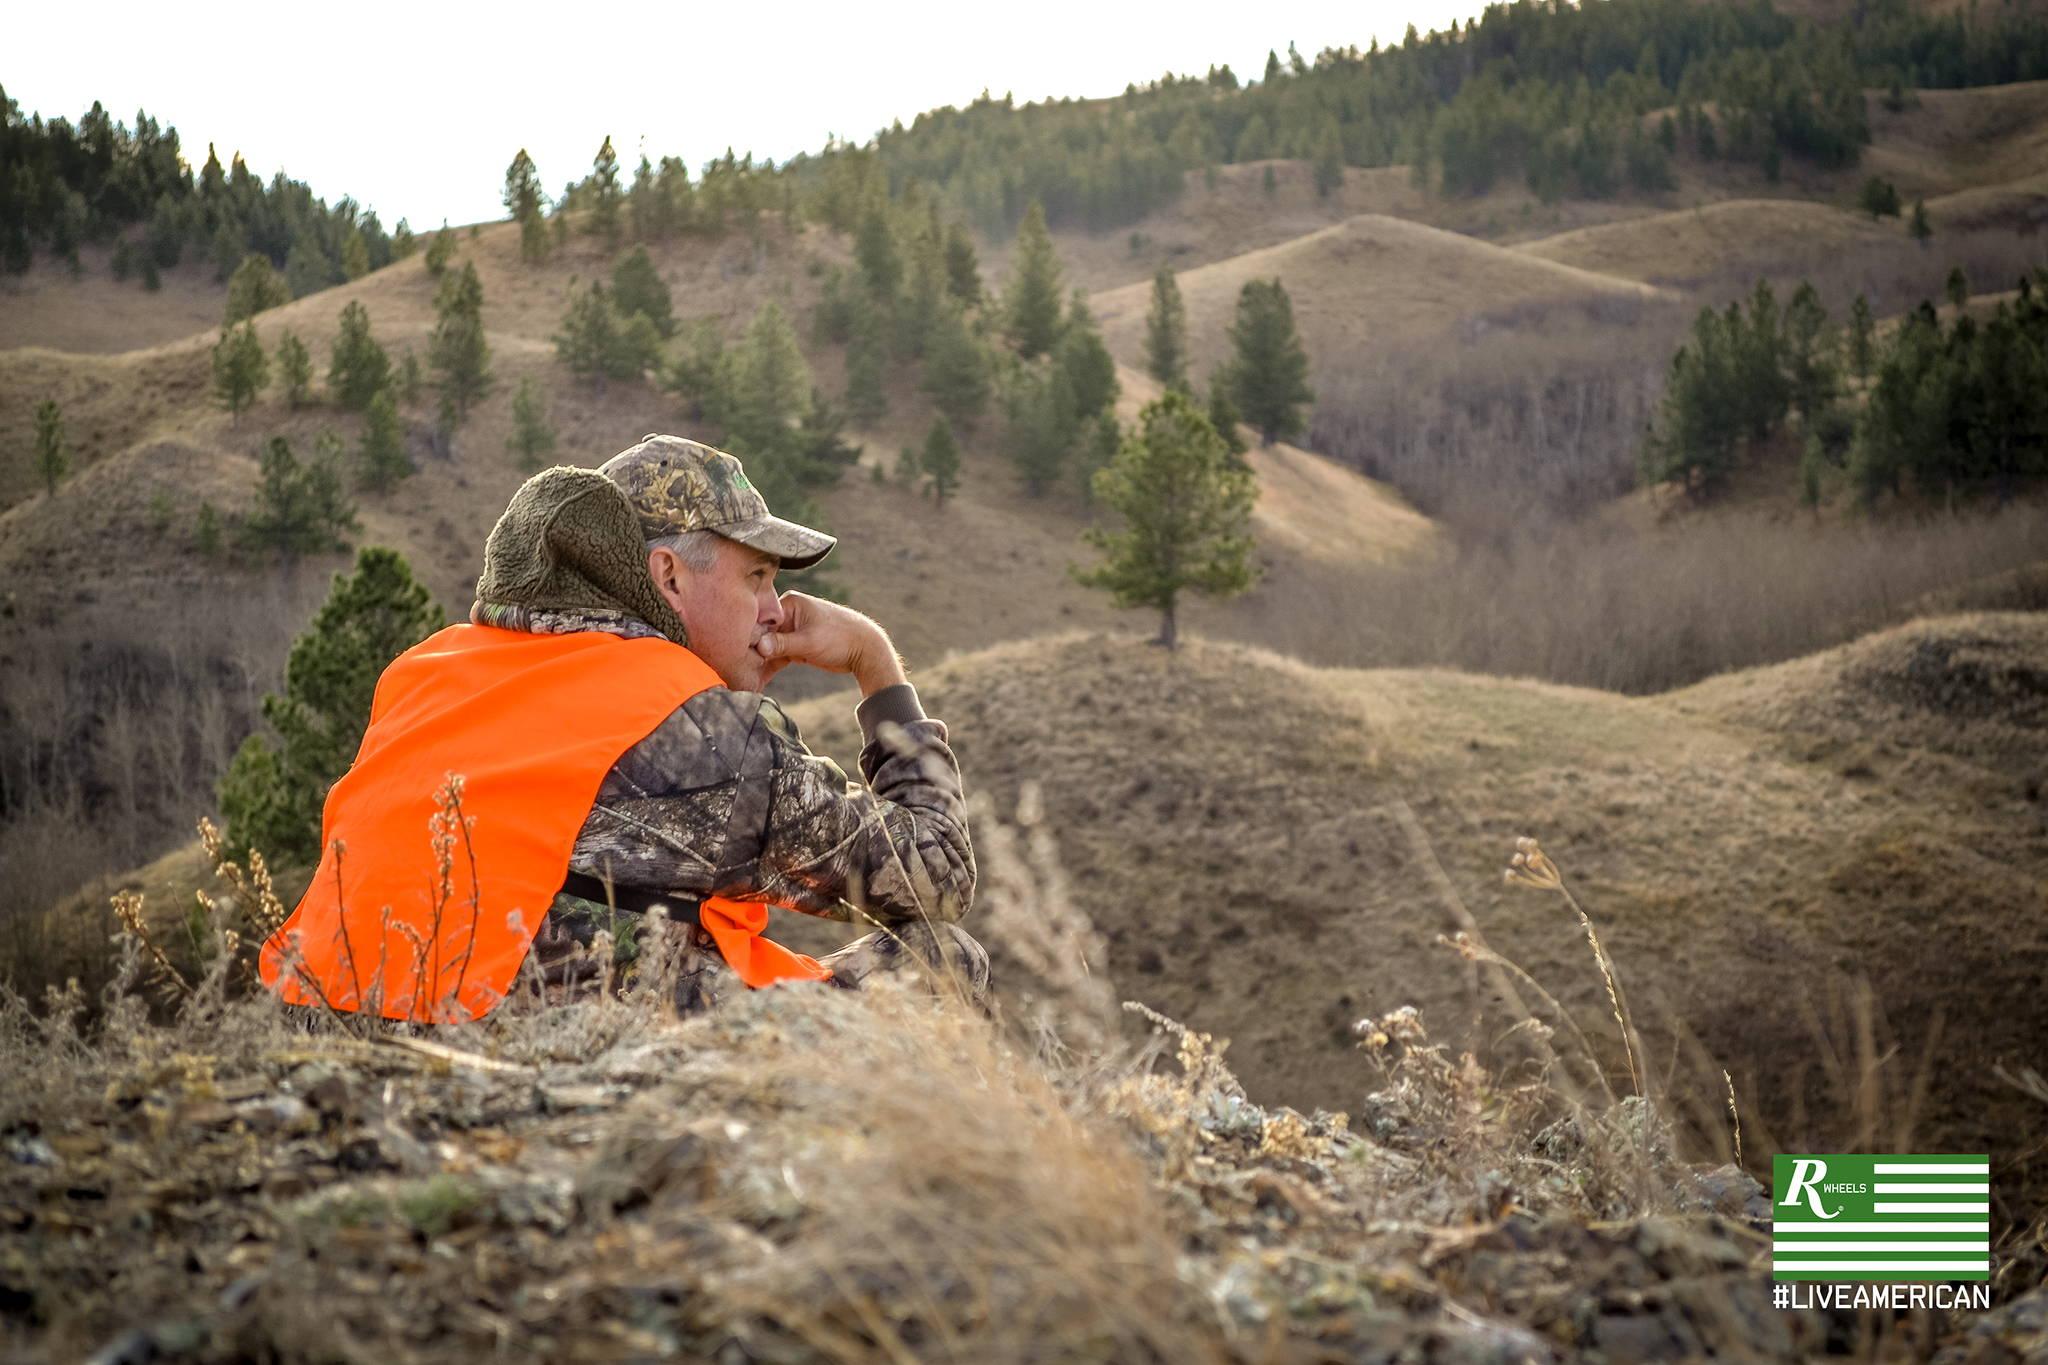 #liveamerican remington wheels outdoors montana hunter henry gaudens